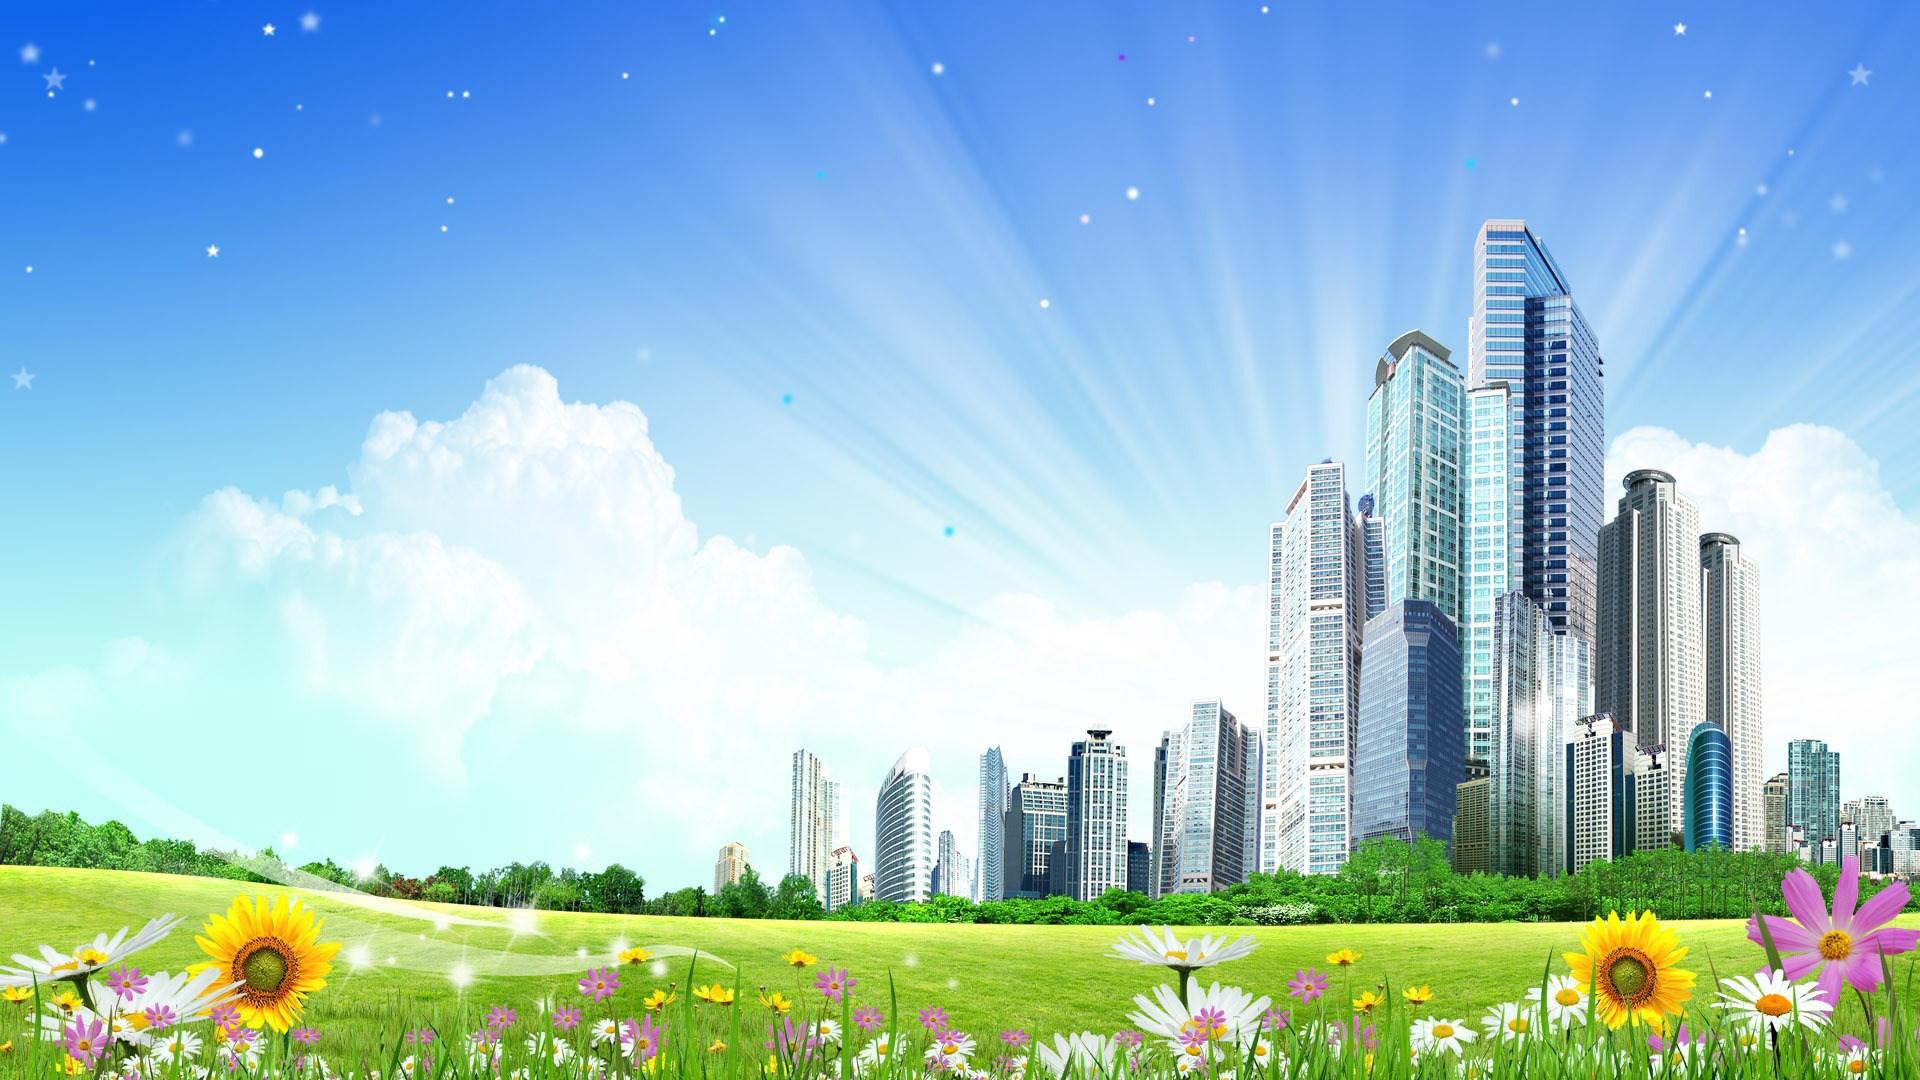 1920x1080-free-desktop-downloads-landscape-wallpaper-wp360788